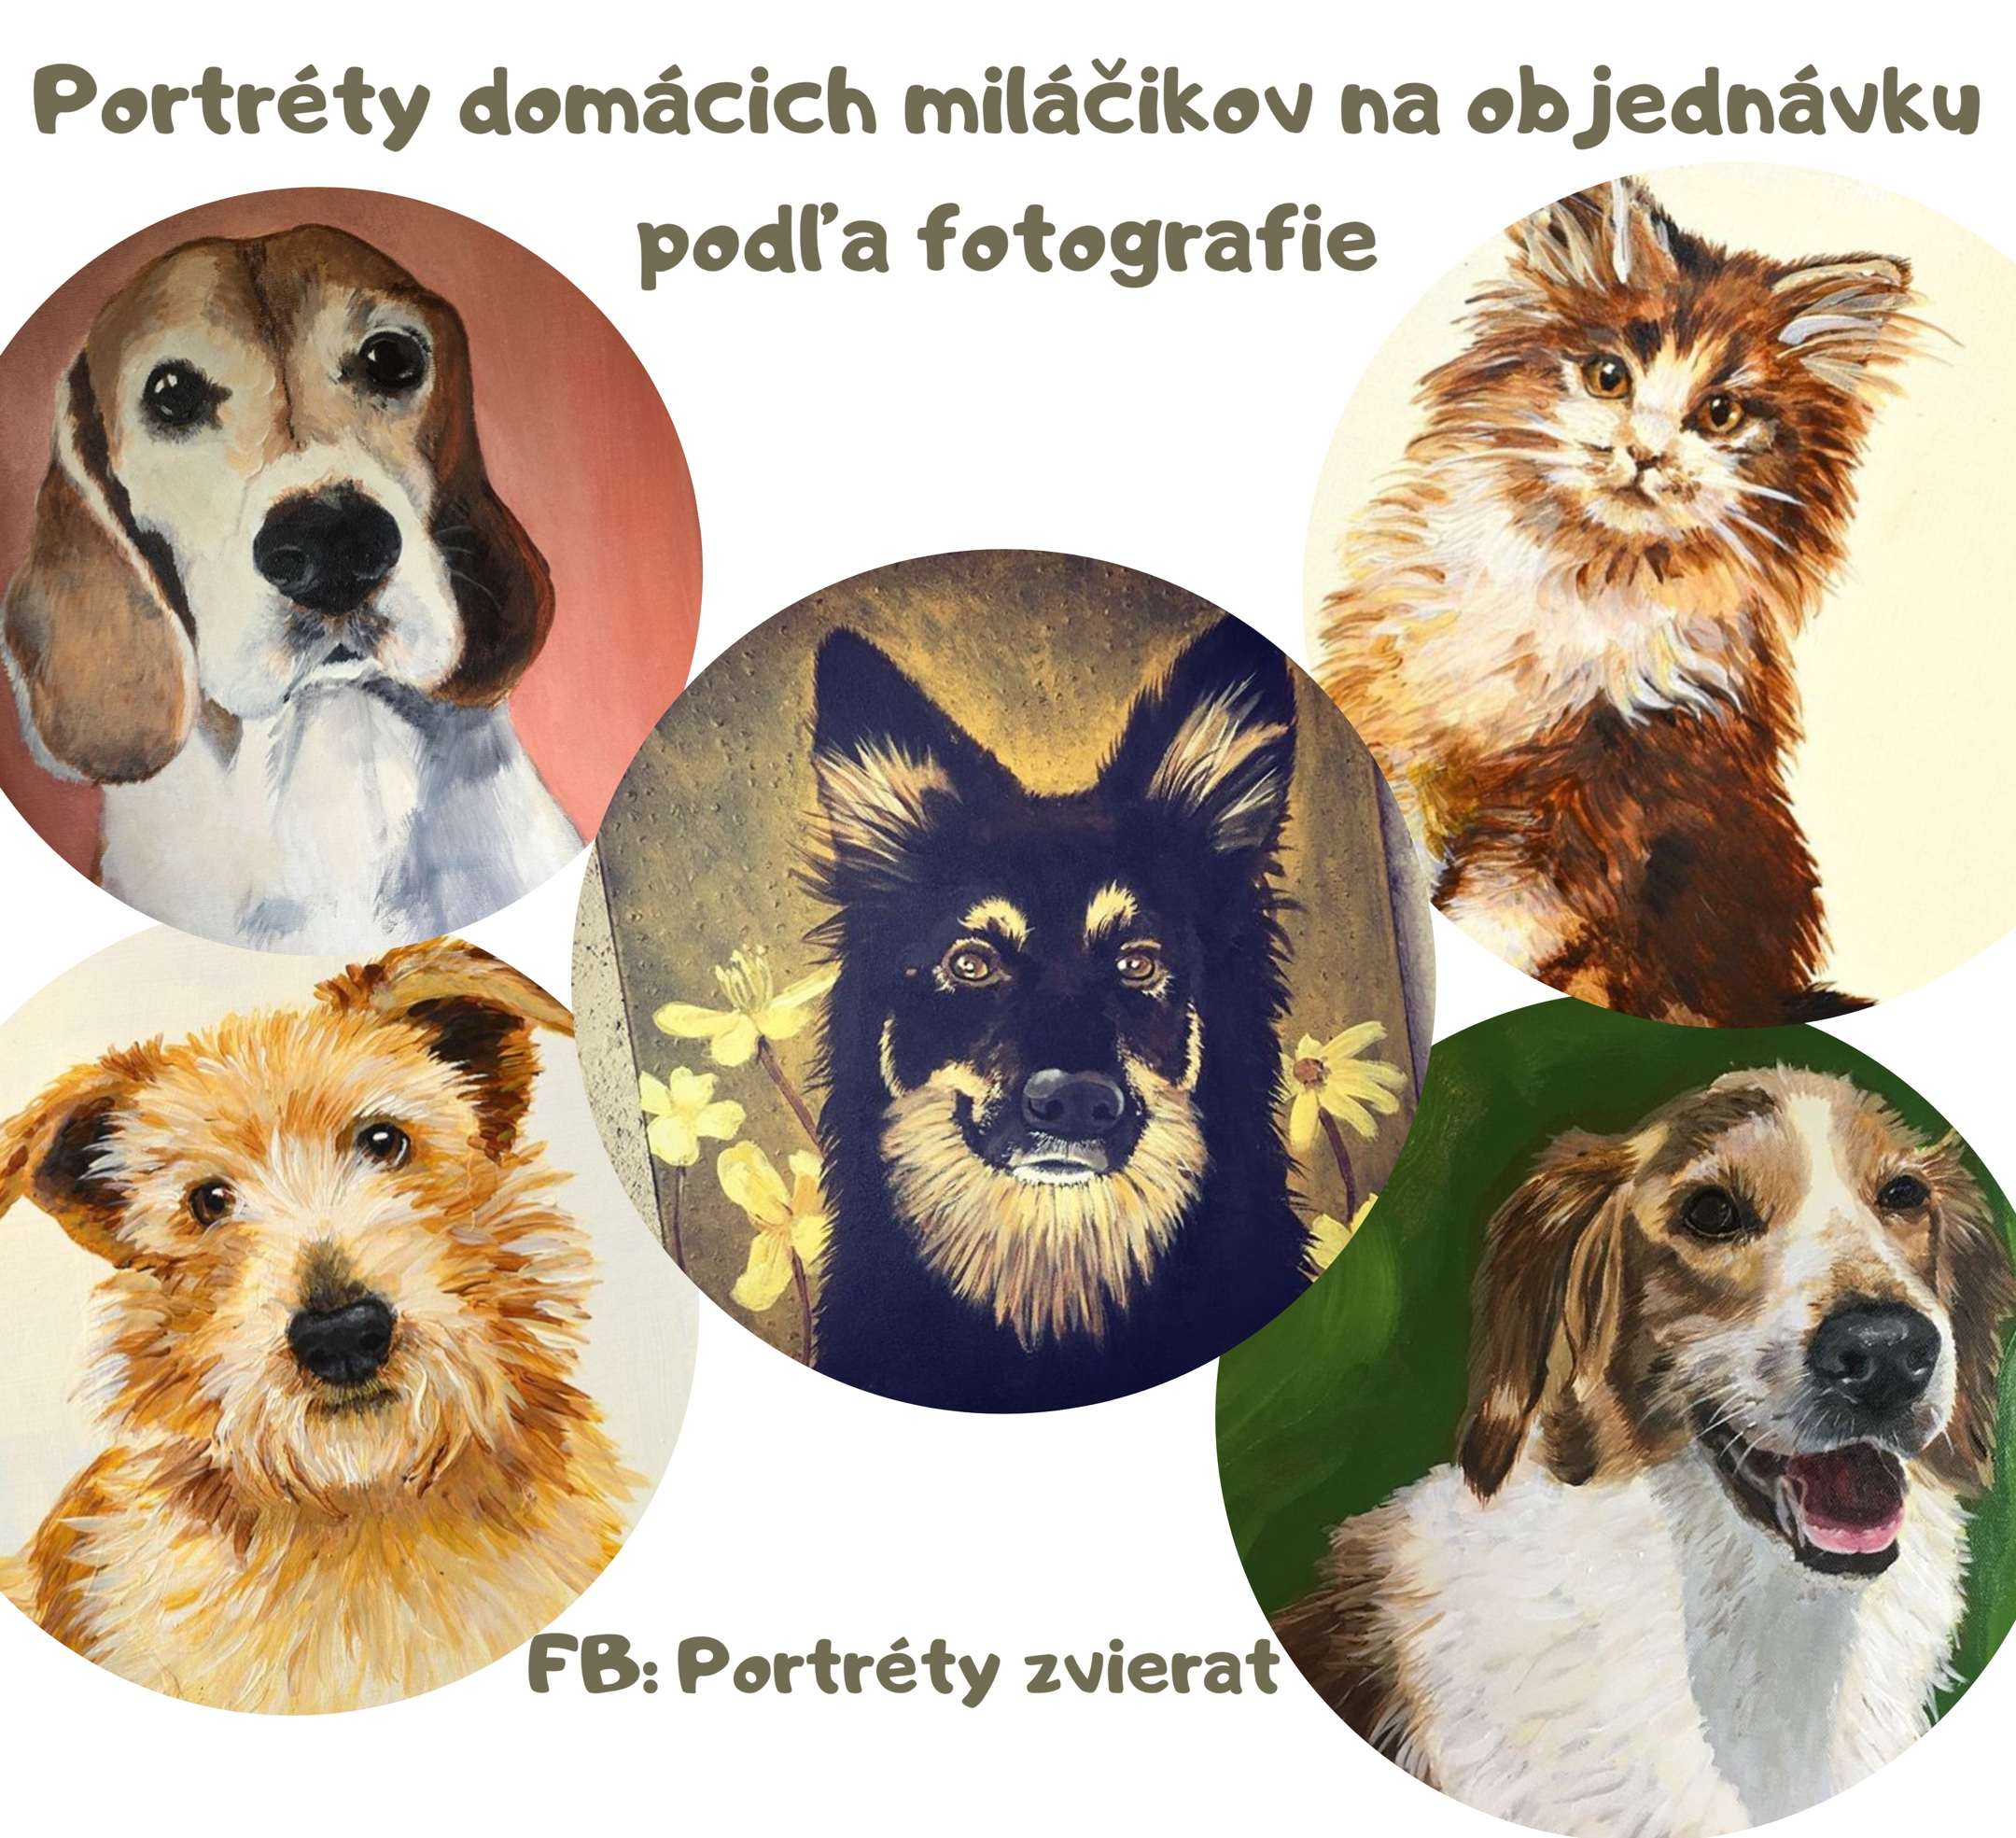 Portréty zvierat